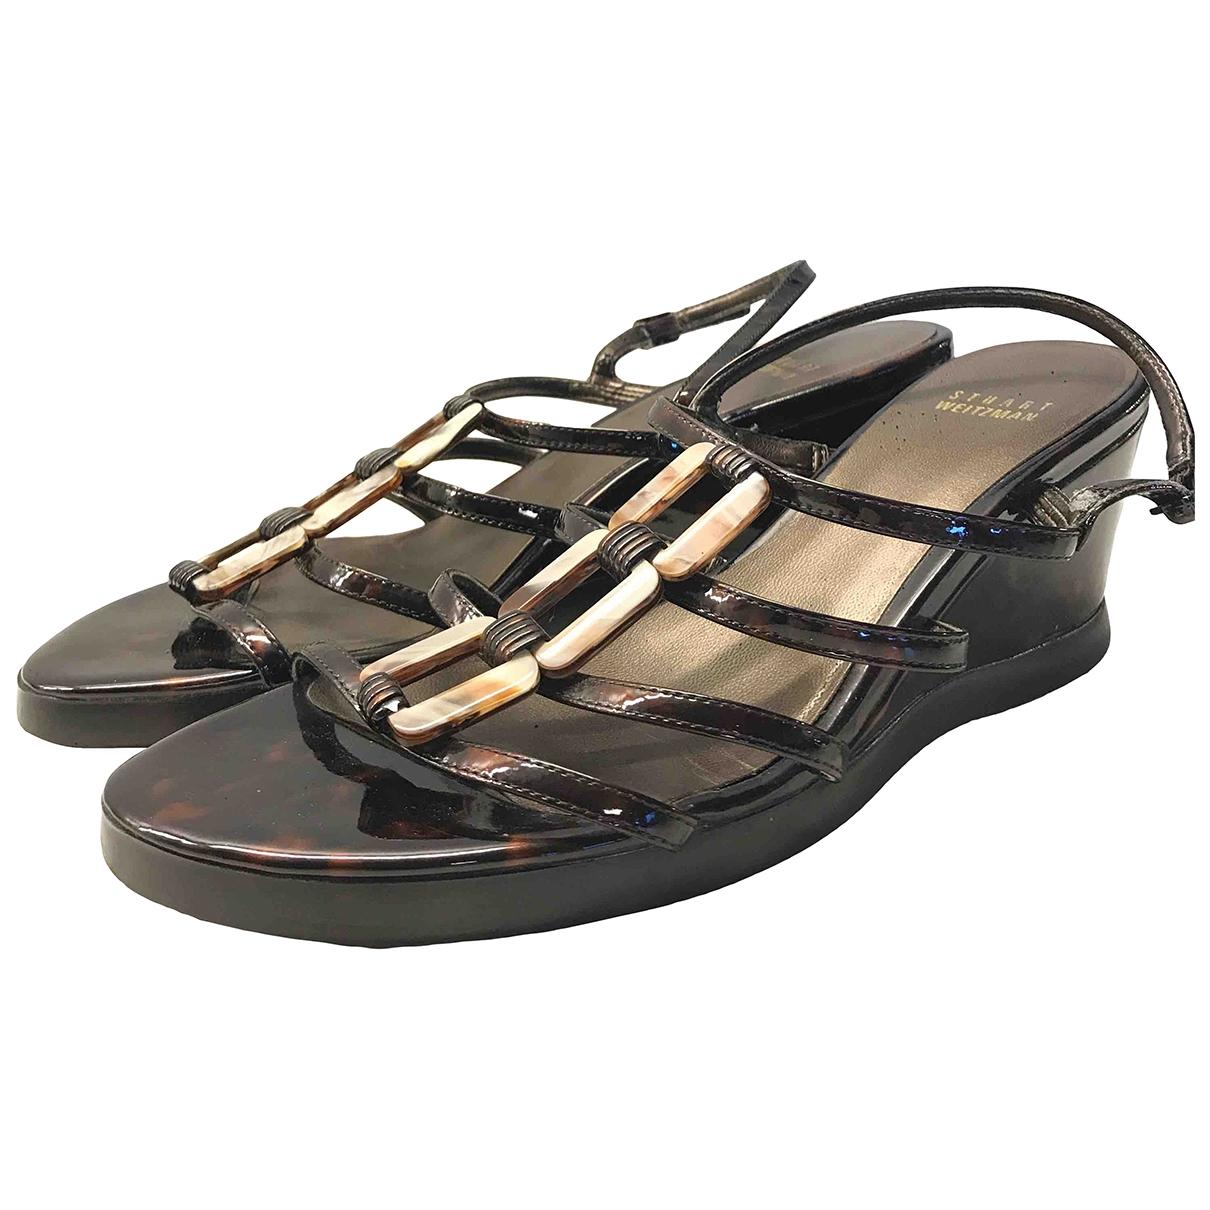 Stuart Weitzman \N Brown Leather Sandals for Women 9 US